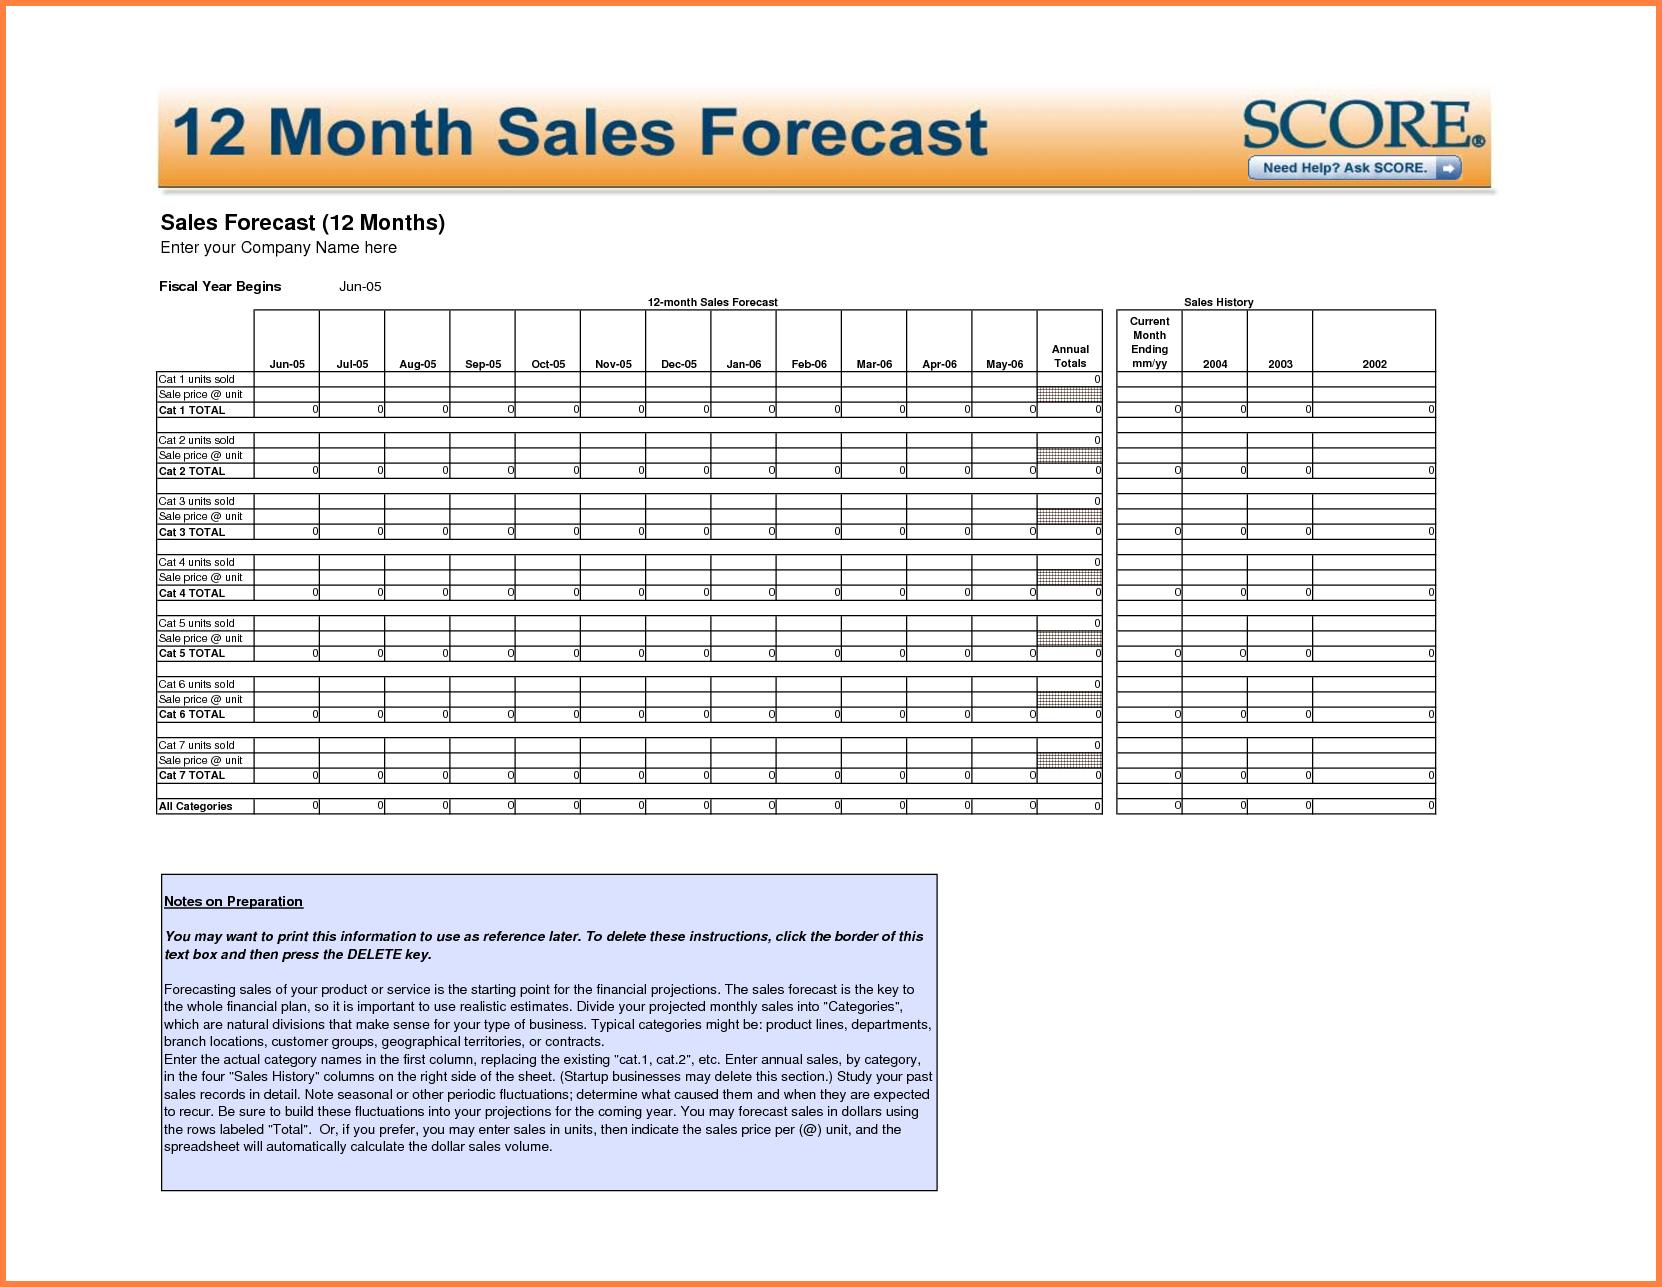 Sales Forecast Excel | Homebiz4U2Profit In Sales Forecast Spreadsheet Template Excel